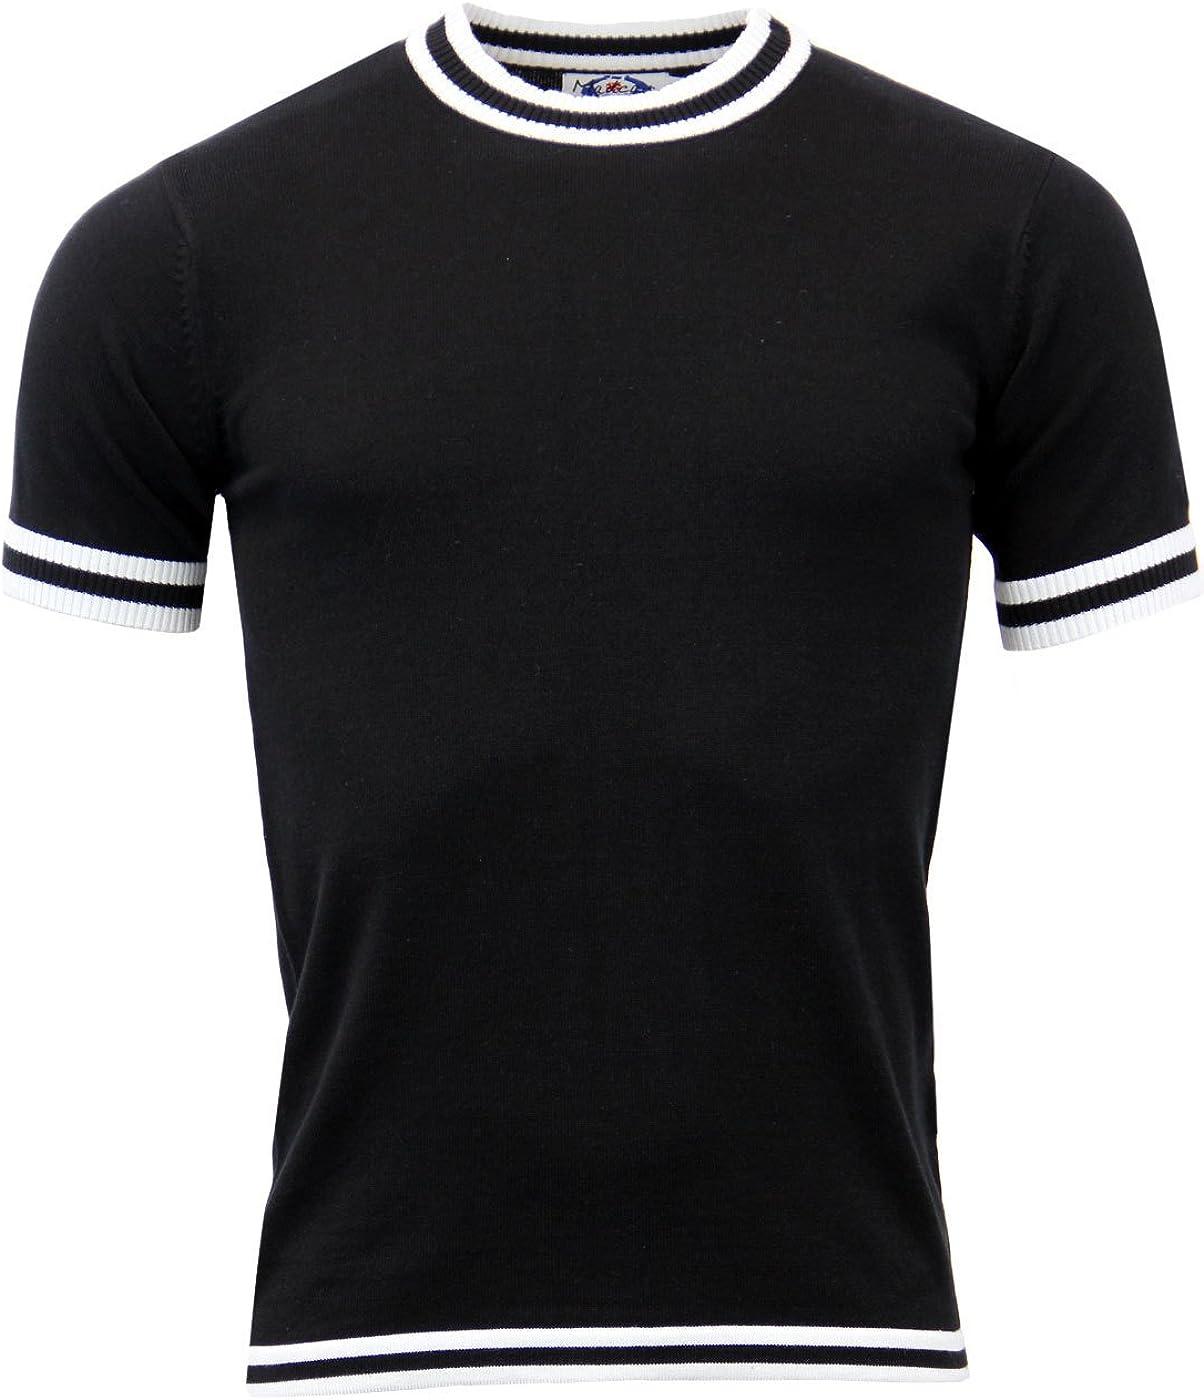 1960s Mens Shirts | 60s Mod Shirts, Hippie Shirts Madcap England Moon Retro Mod Short Sleeve Knitted Jumper £29.99 AT vintagedancer.com